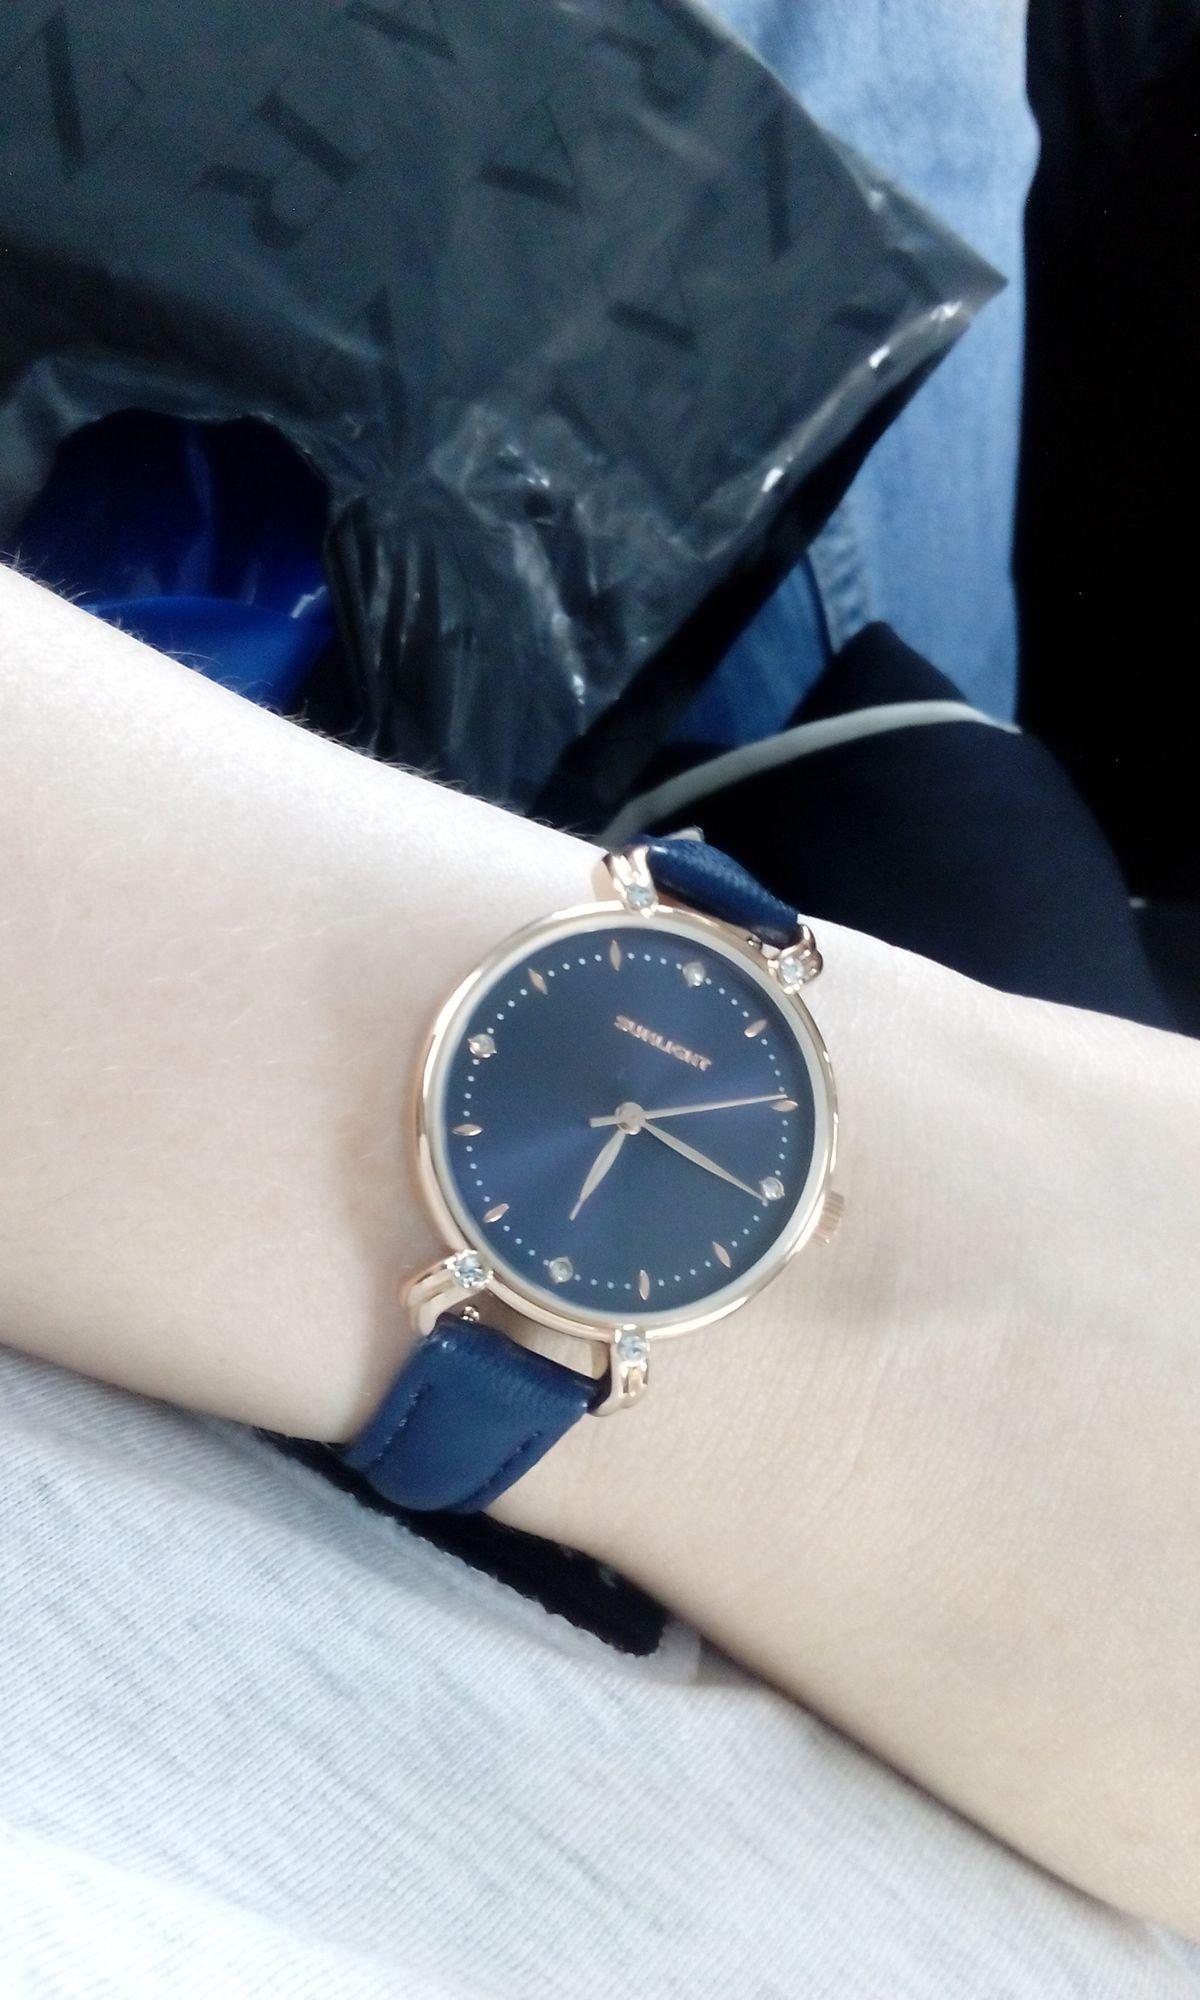 Аккуратные женственные часы